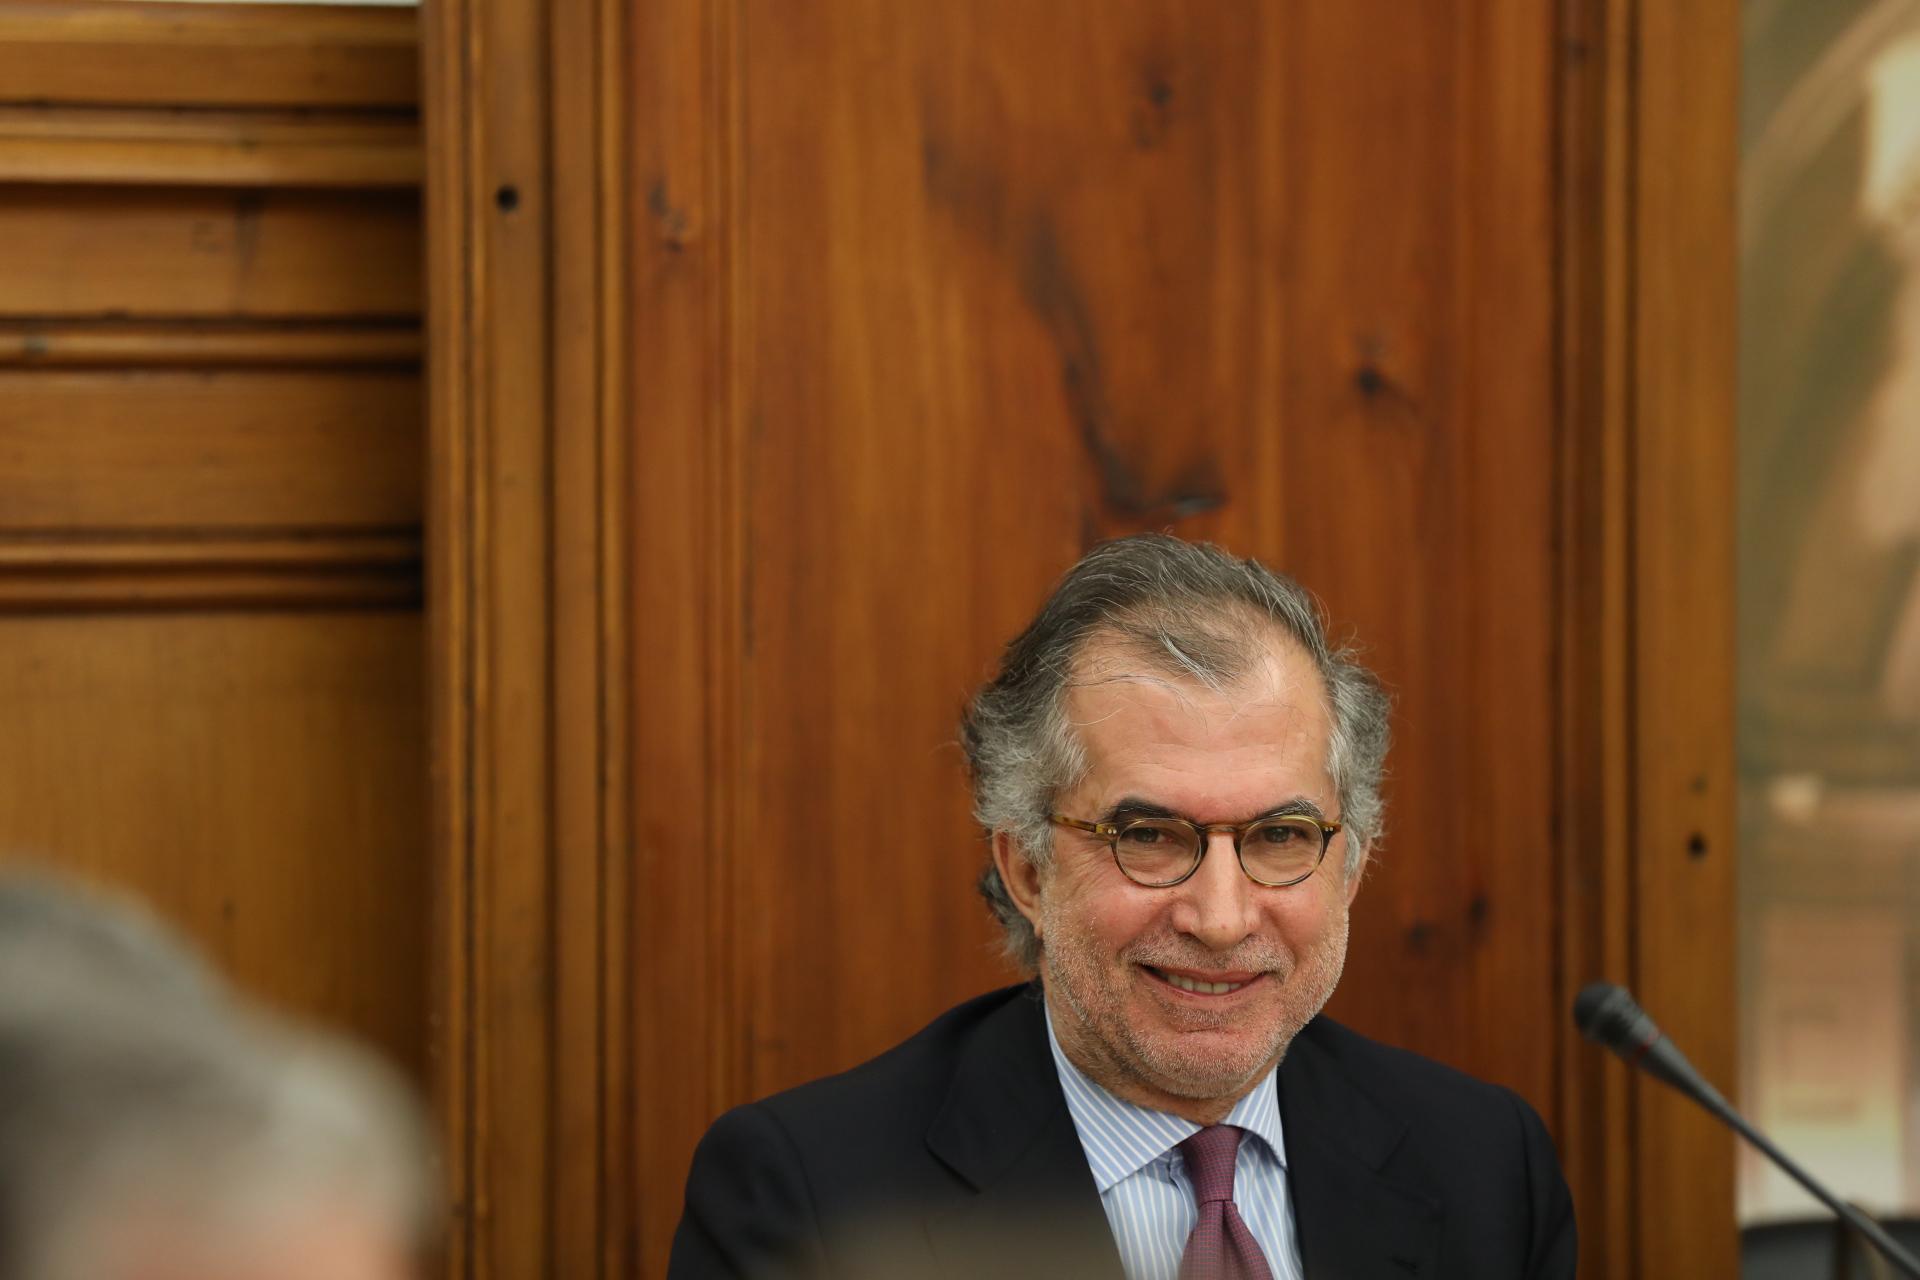 Comissão de Inquérito CGD Caixa Geral de Depósitos Domingues